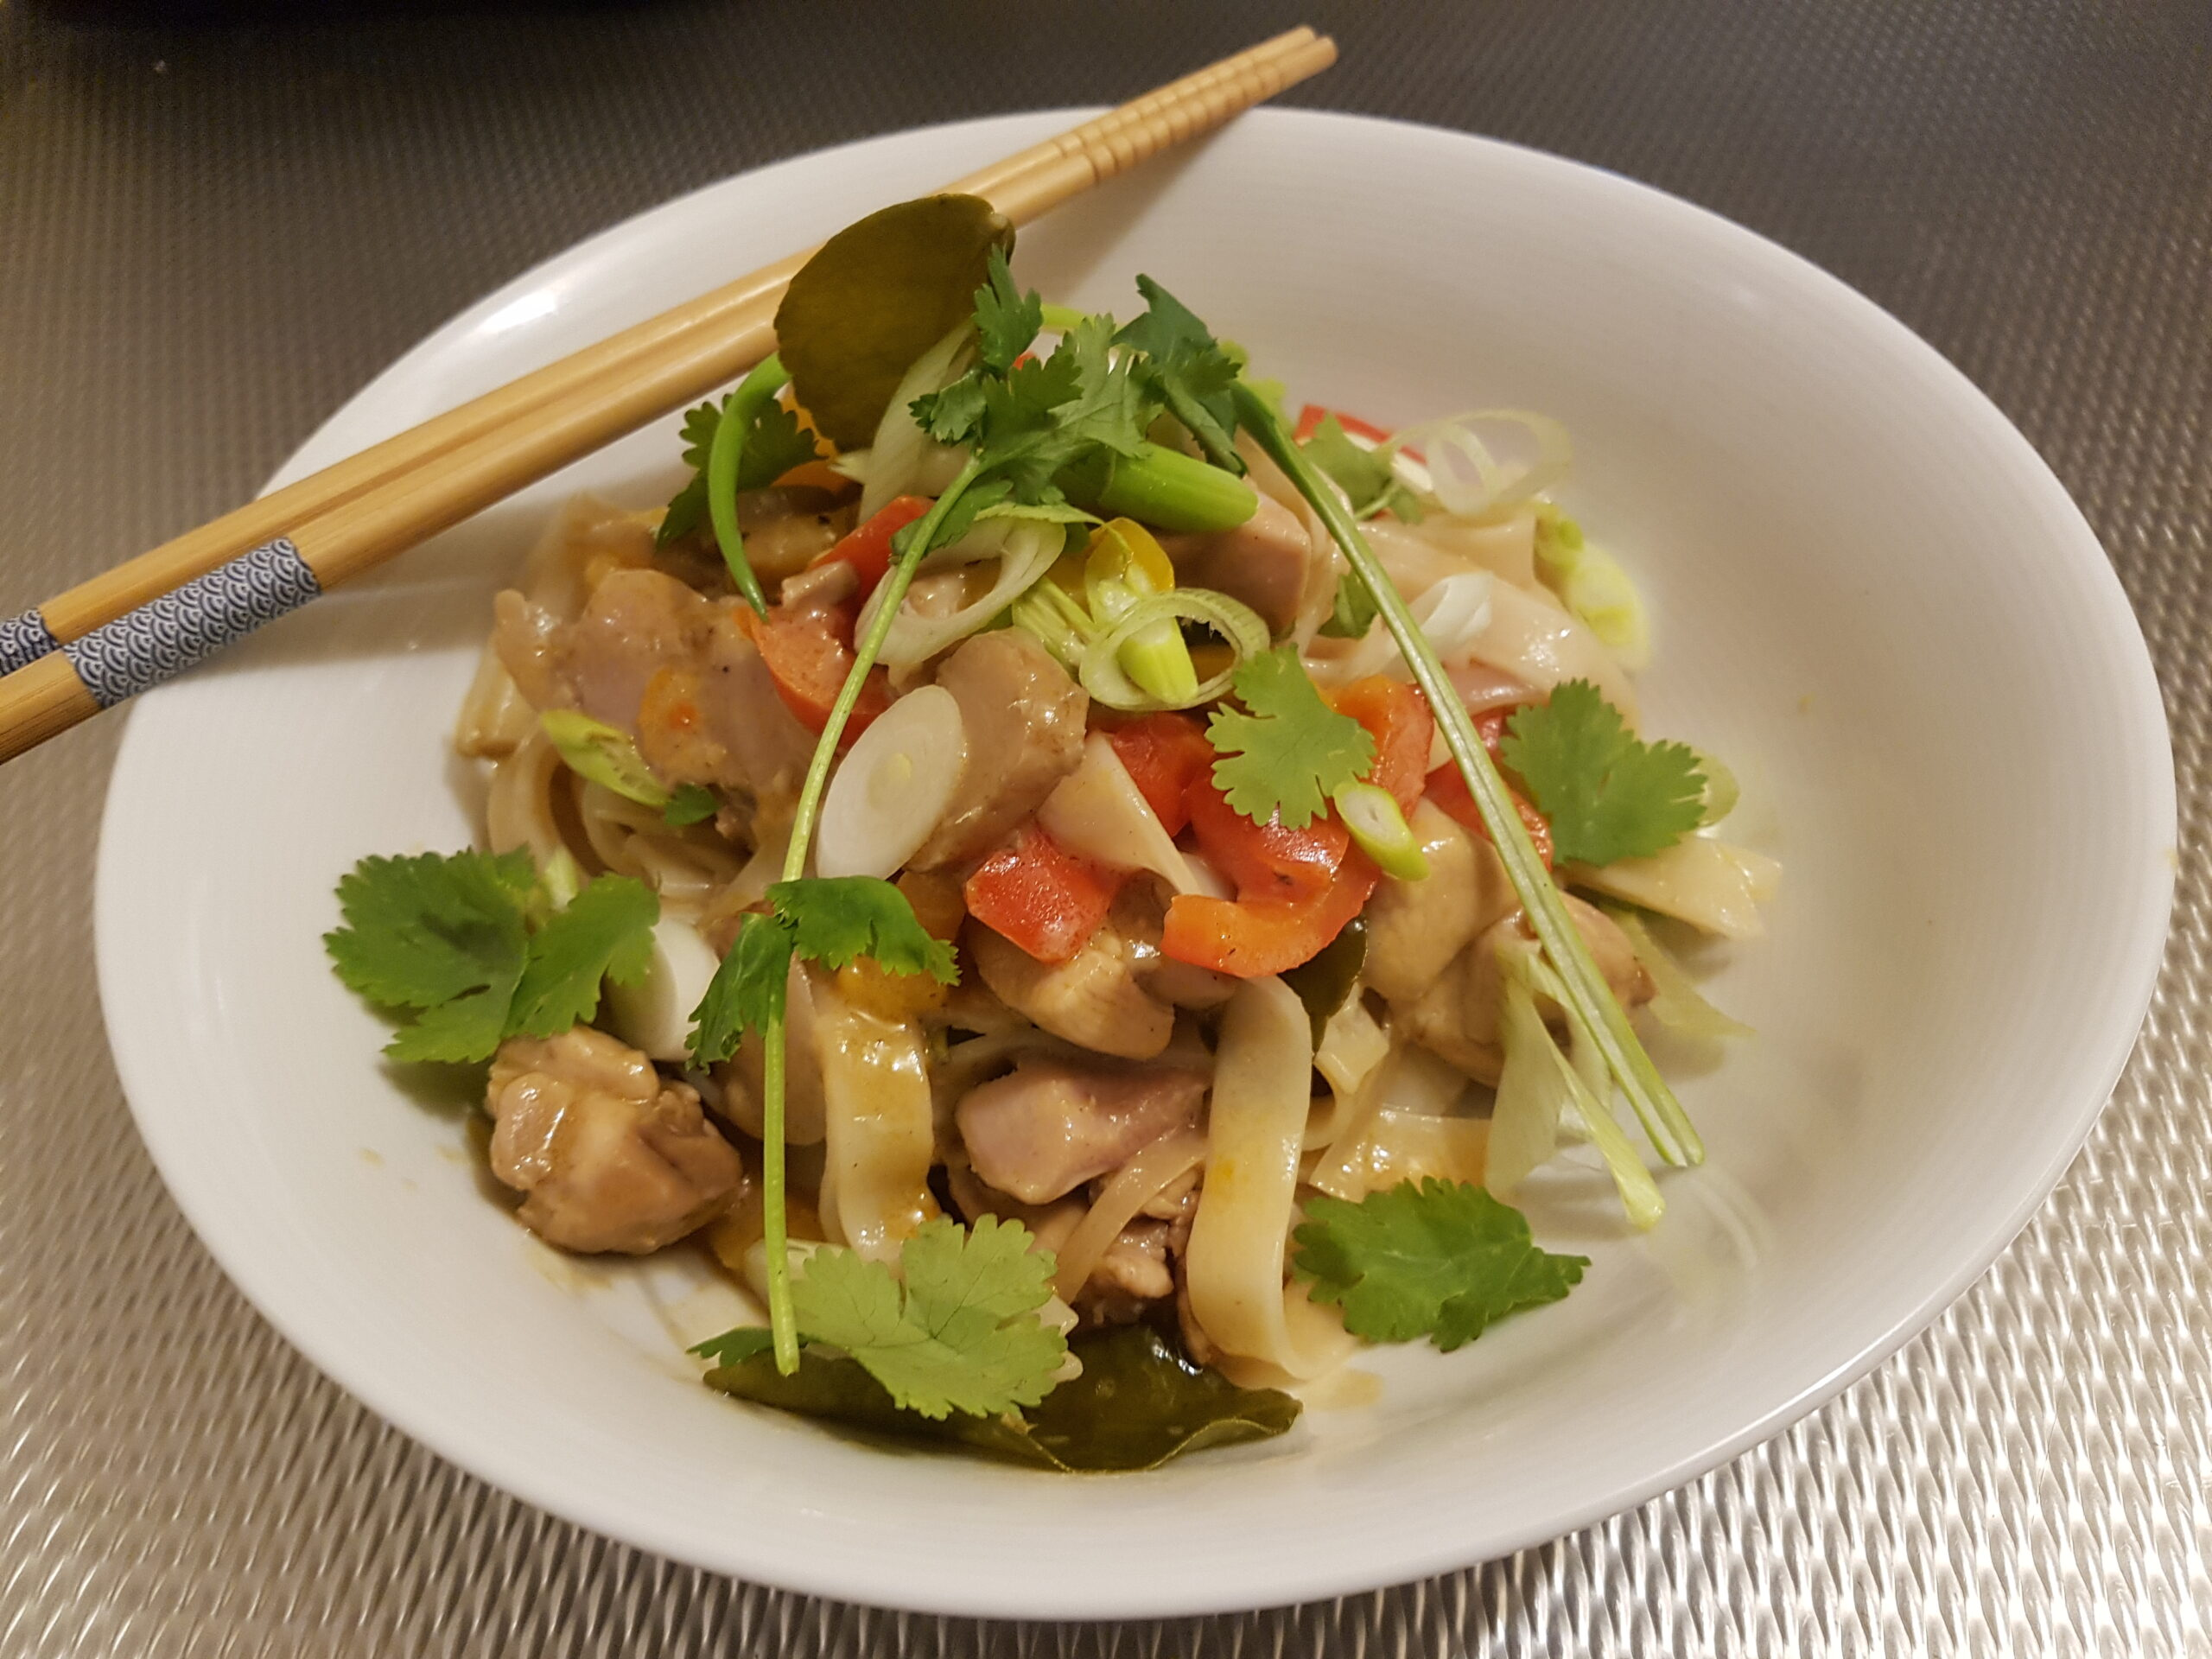 Thaise kip met paprika, kokos en rijstnoedels